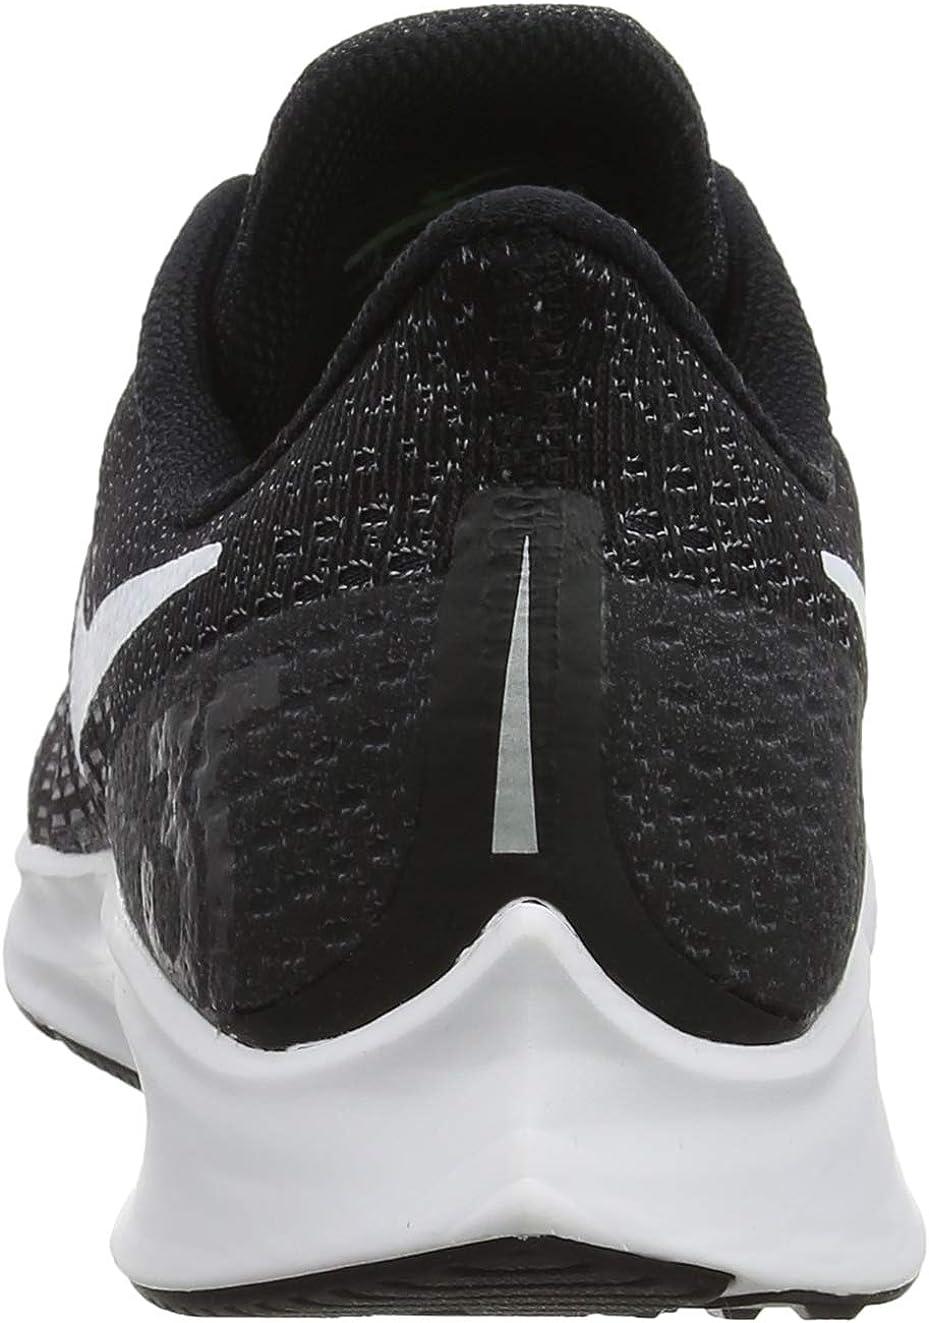 | Nike Men's Training Shoes | Road Running